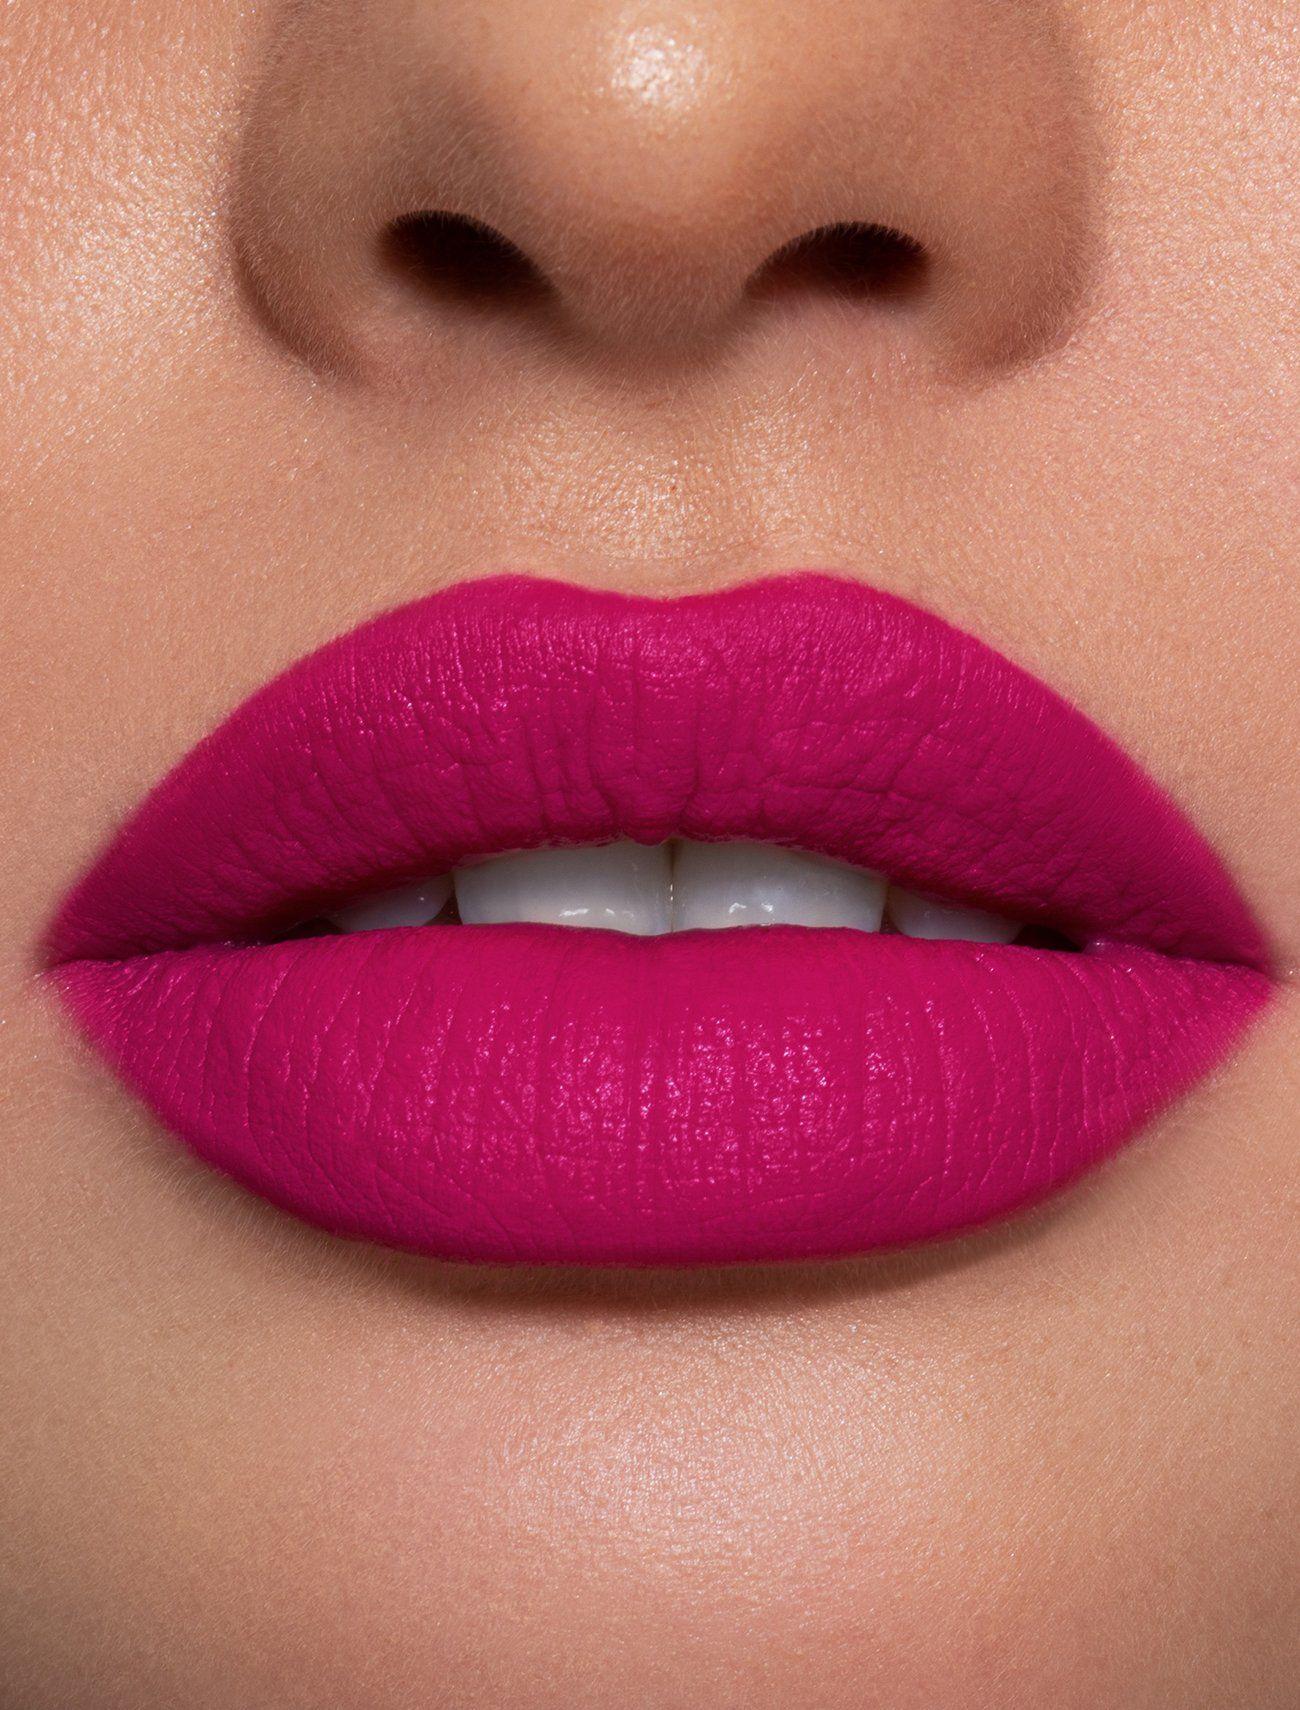 Vacay Matte Lipstick In 2020 Pink Lips Makeup Pink Lipstick